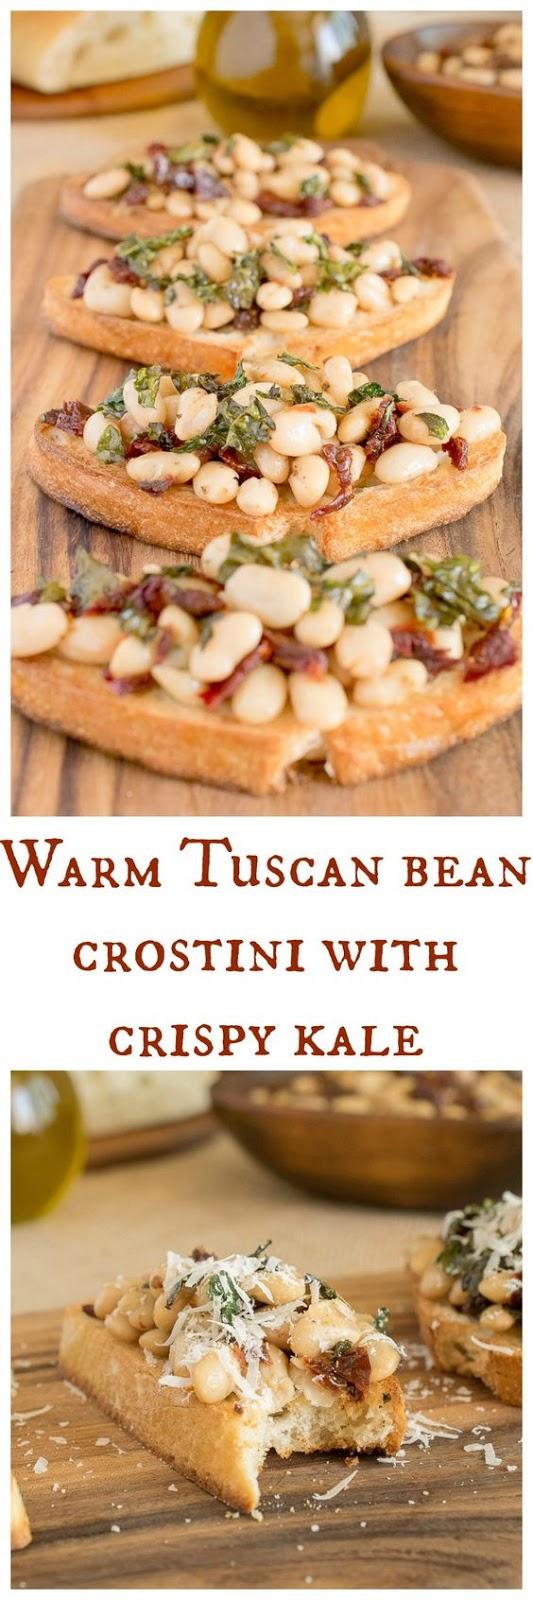 Warm Tuscan Bean Crostini with Crispy Kale